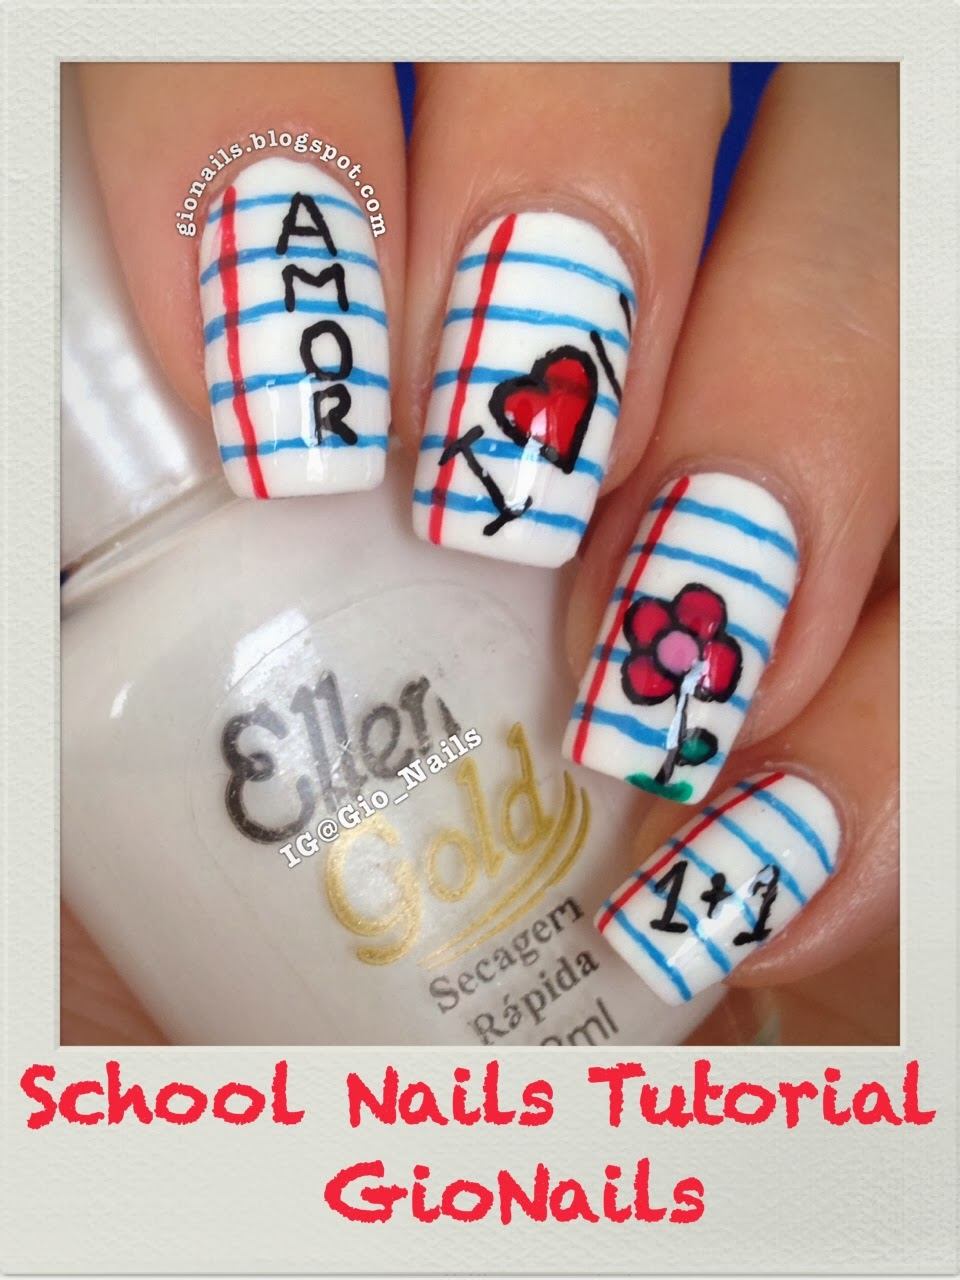 http://gionails.blogspot.be/2014/02/tutorial-school-nails.html